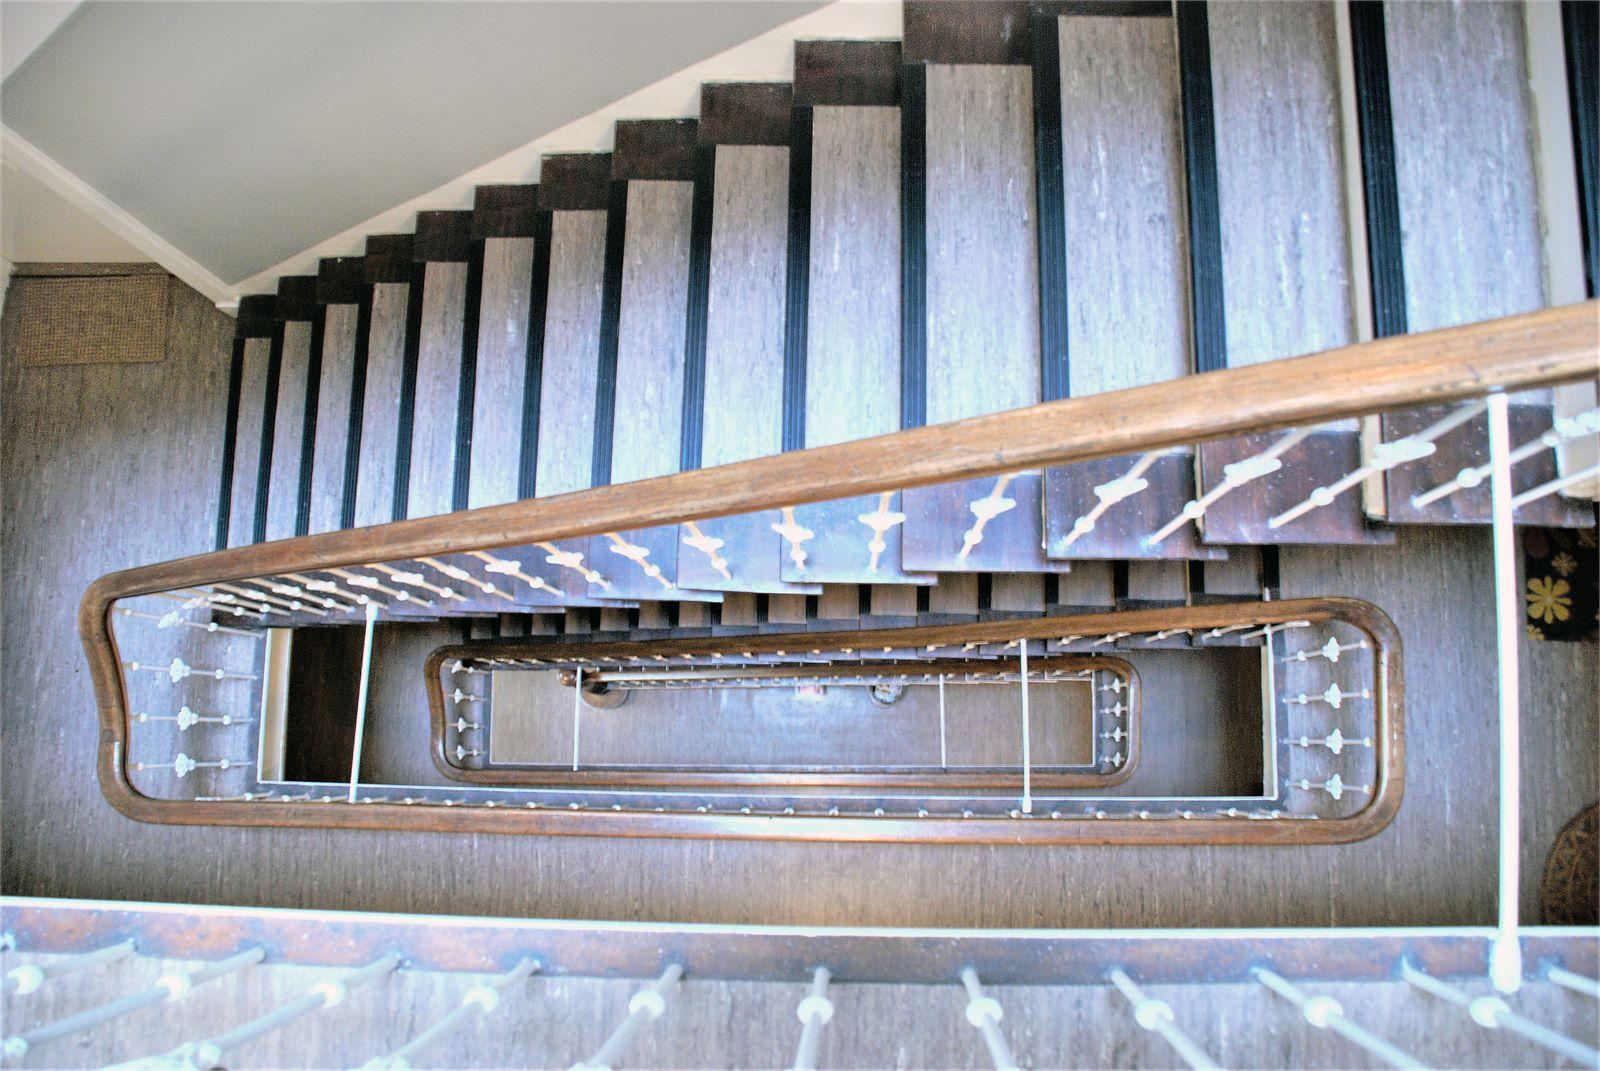 Charmanter Altbau In Eppendorf Mit Balkon Monnier Immobilien Gmbh